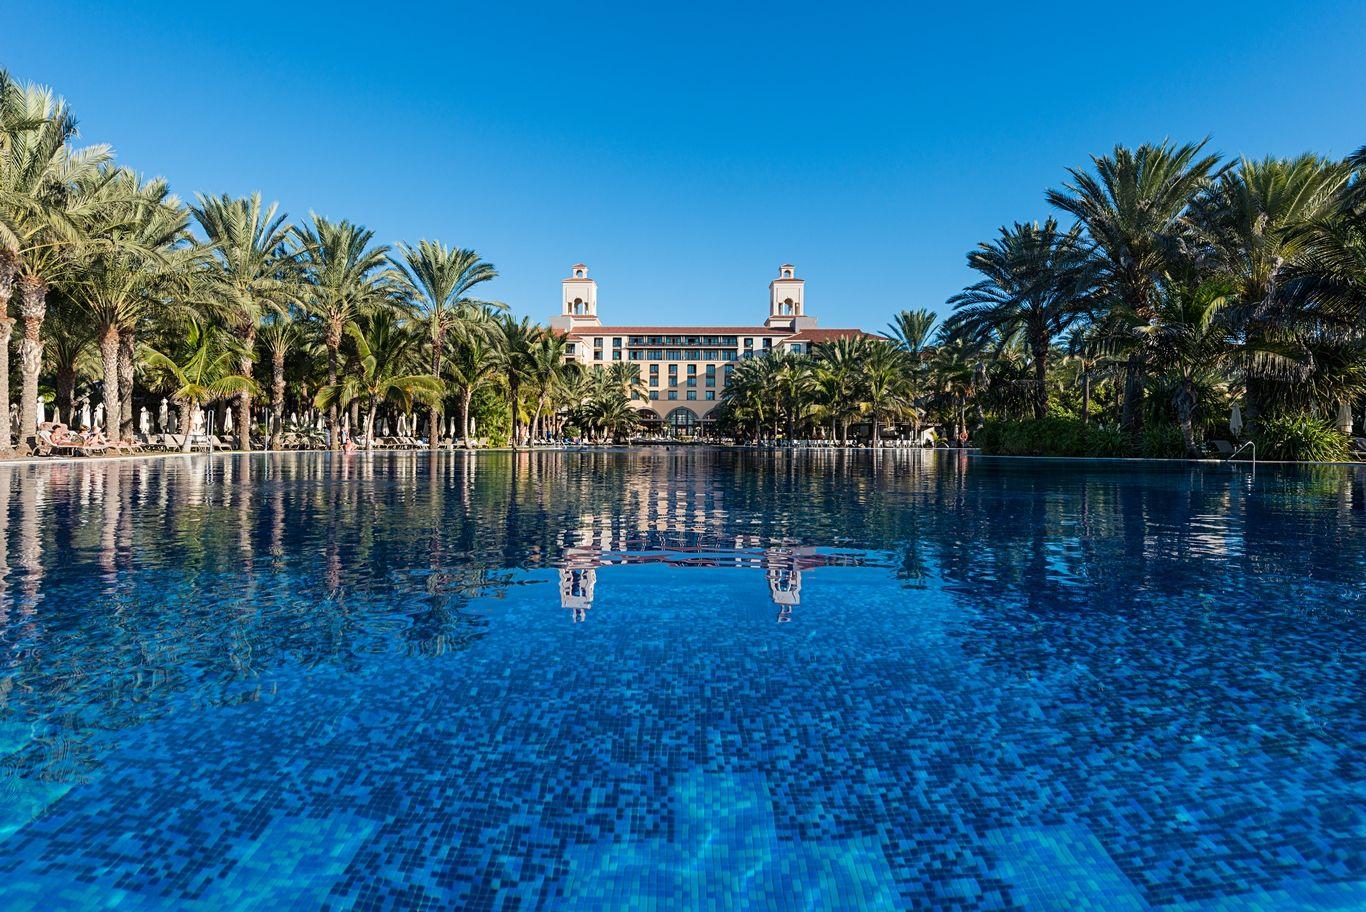 Séjour Lanzarote - APPART HOTEL HSA FICUS 3*(NL)